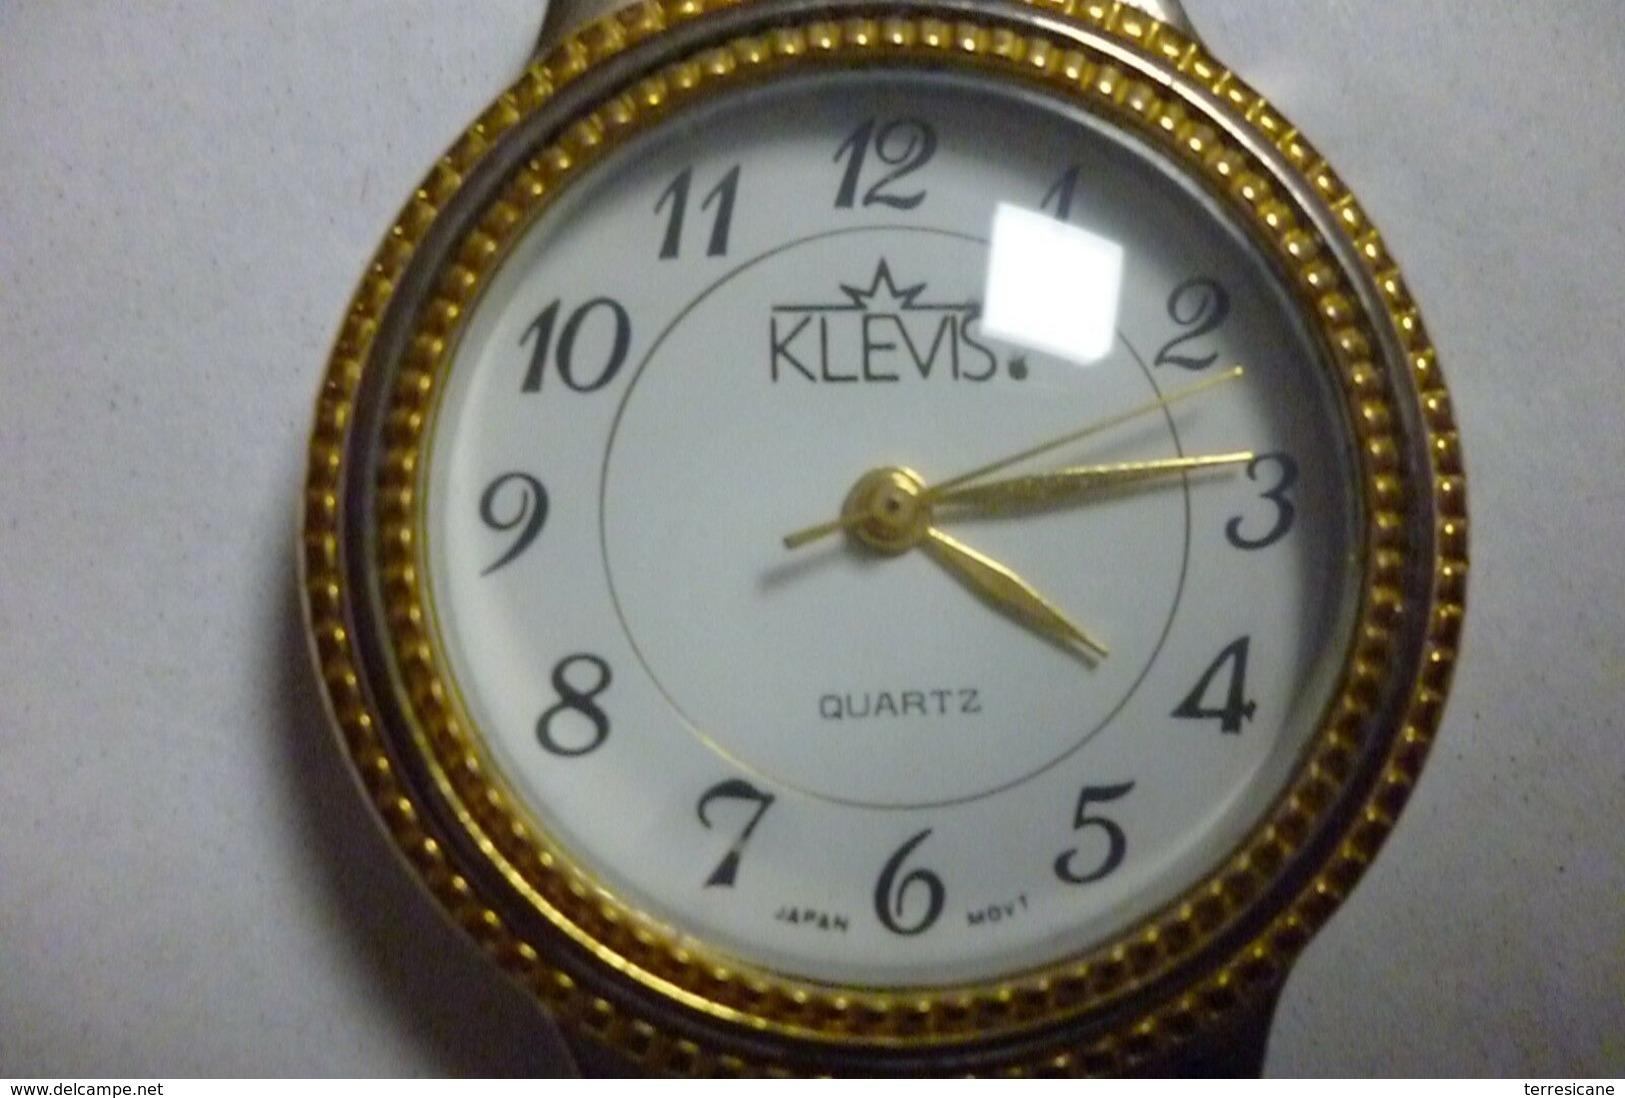 OROLOGIO POLSO VINTAGE KLEVIS QUARTZ JAPAN 18K GOLD PLATED FERMO DA TEMPO - Orologi Da Polso